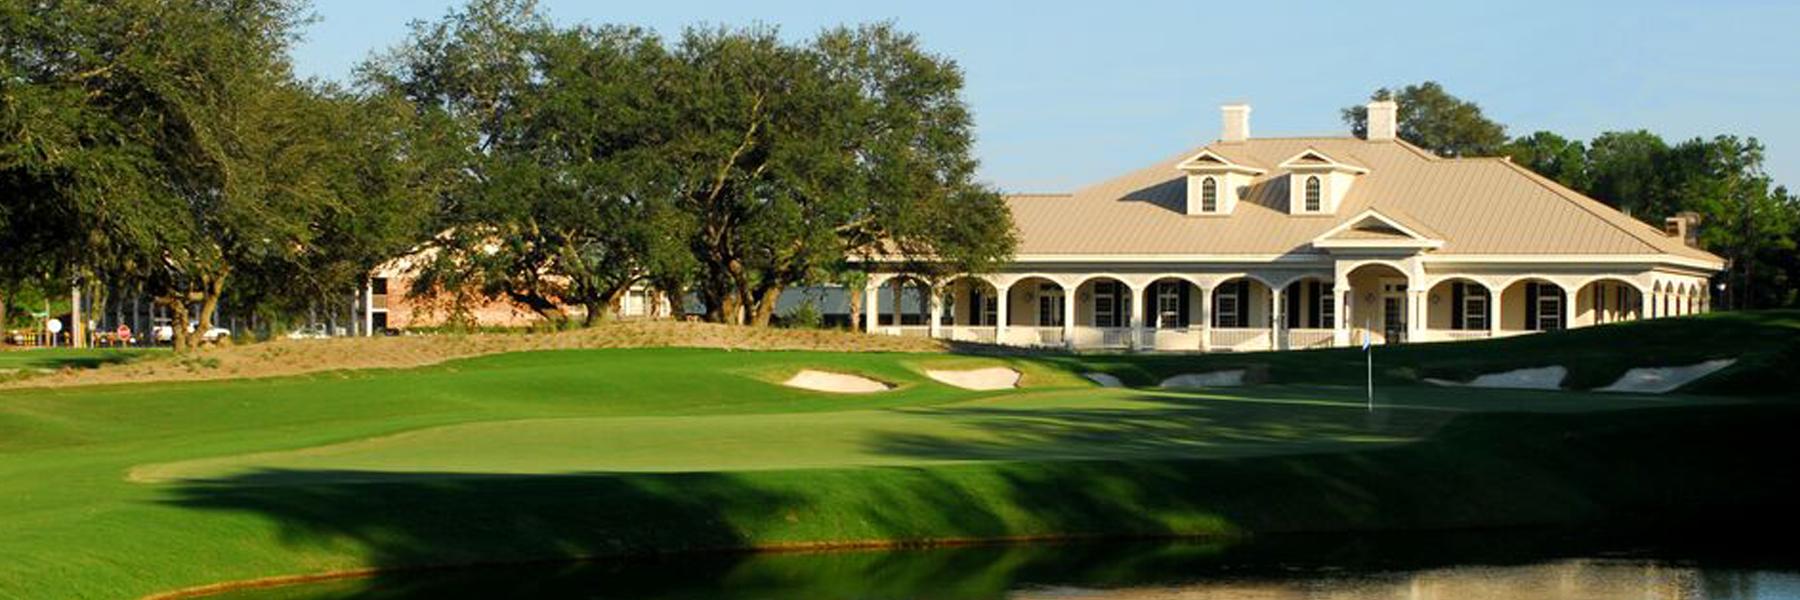 River Club Golf Course Pawleys Island South Carolina